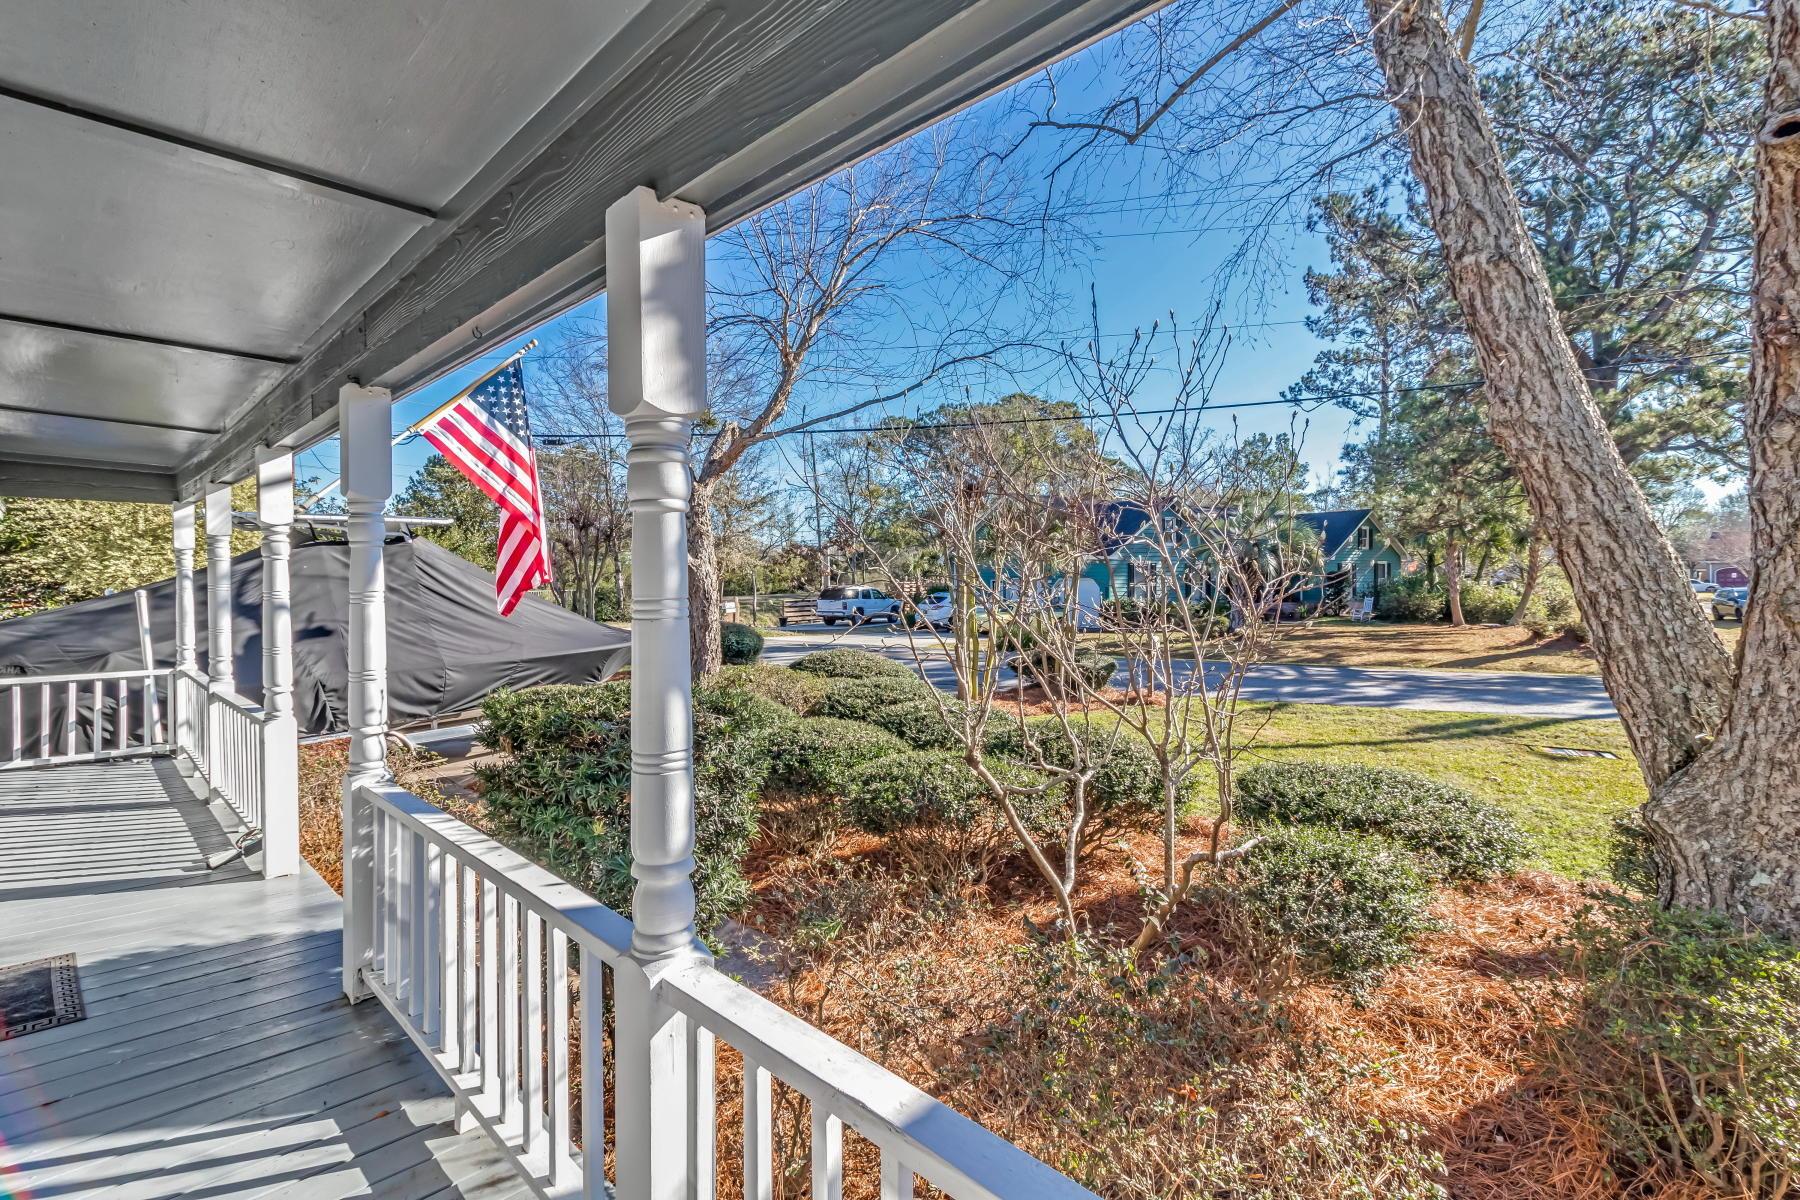 Harrison Acres Homes For Sale - 51 Markfield, Charleston, SC - 0